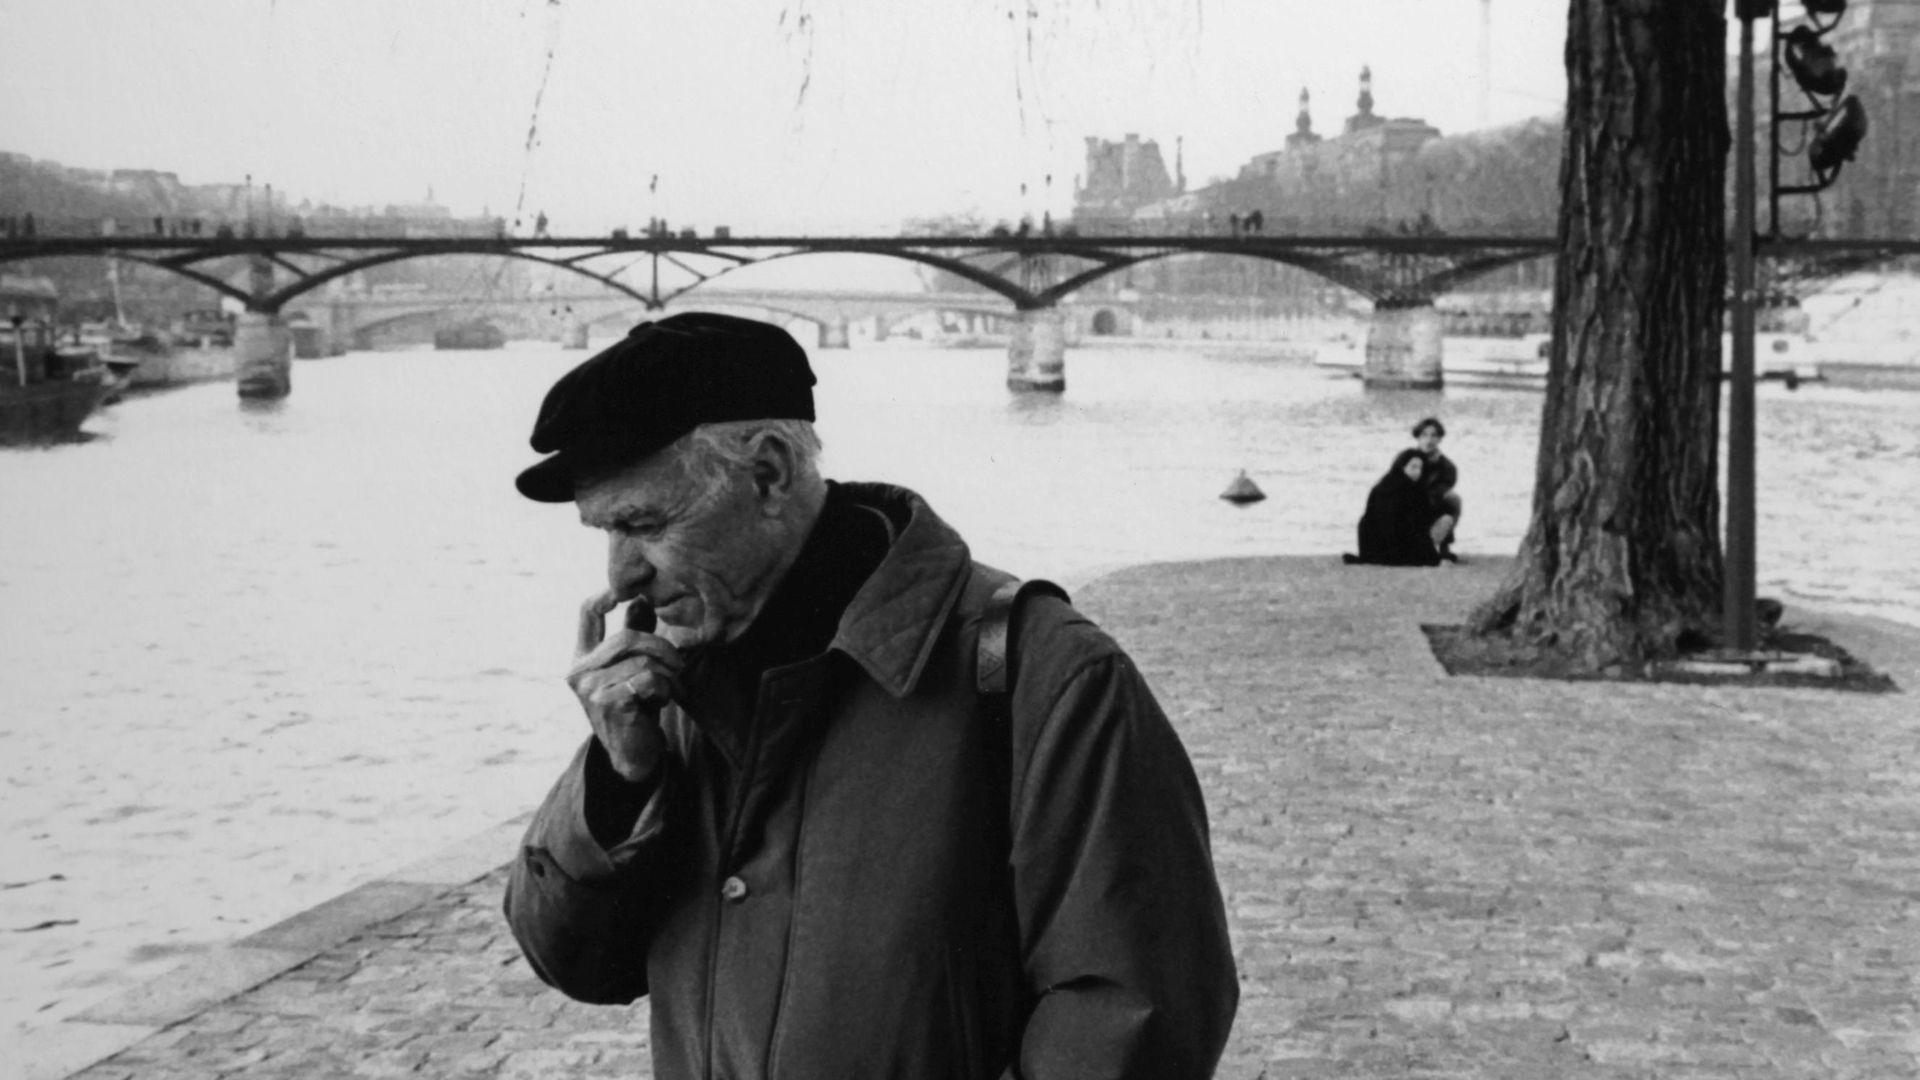 Robert Doisneau in the Square du Vert Galant, in Paris, in 1993 in Paris, France - Credit: Gamma-Rapho via Getty Images